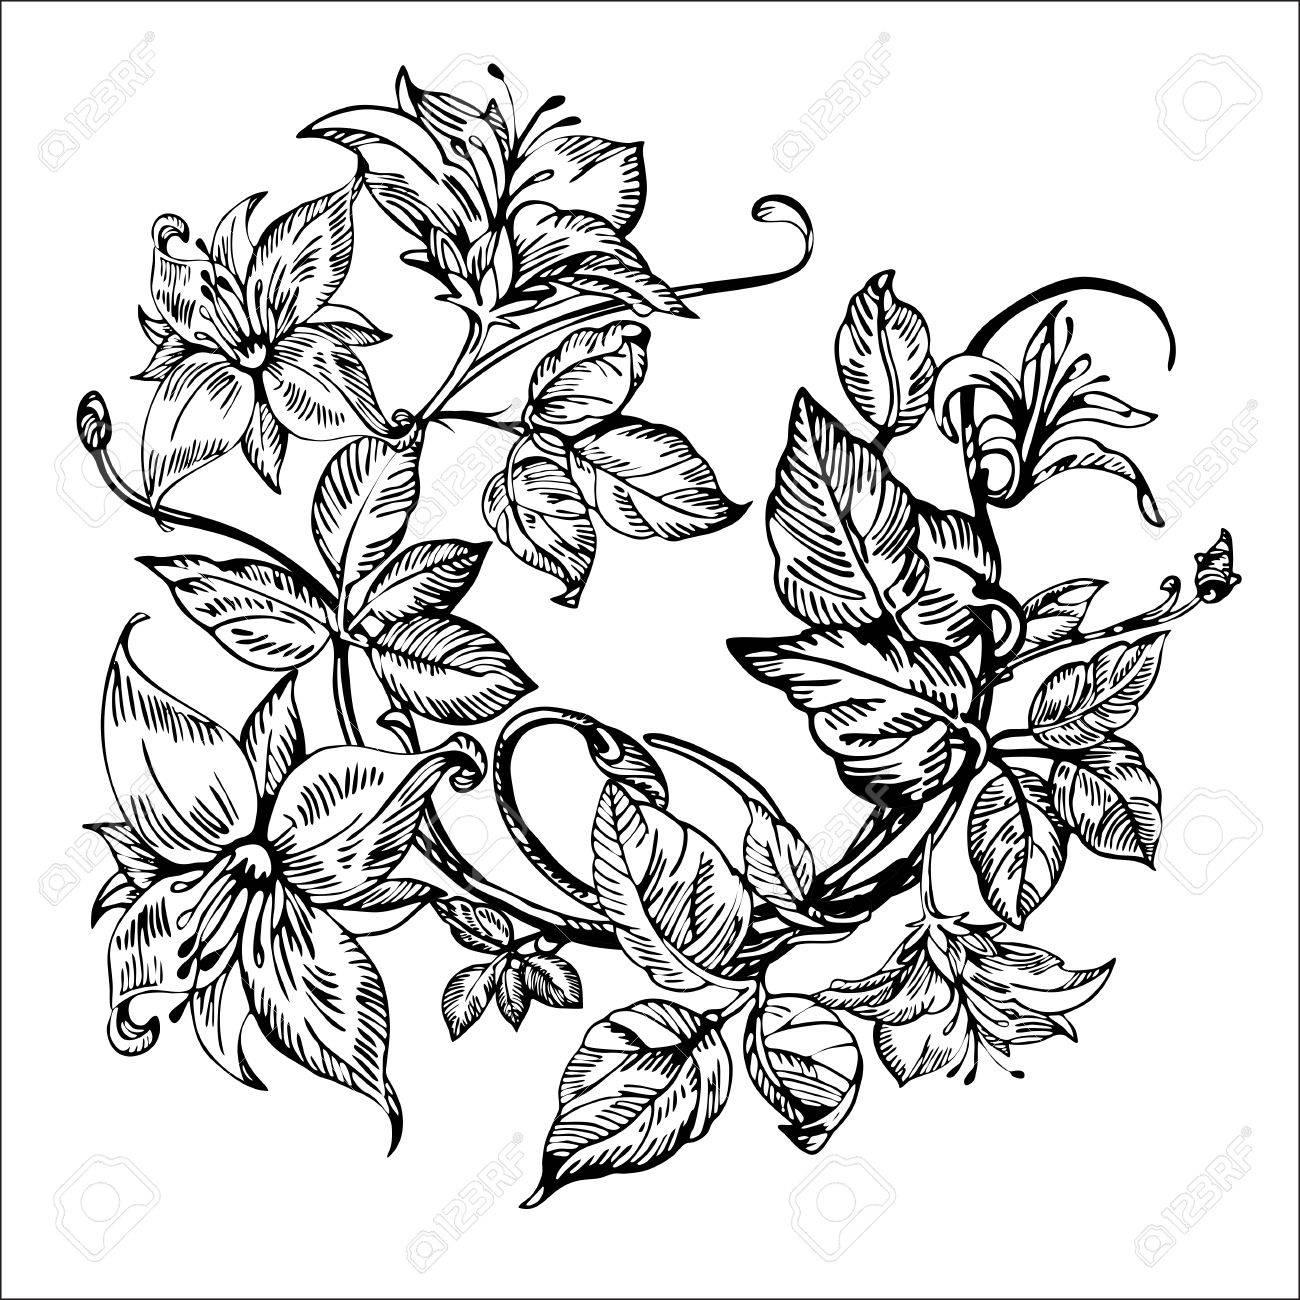 Jahrgang Eleganten Blumen Schwarz Weiss Vektor Illustration